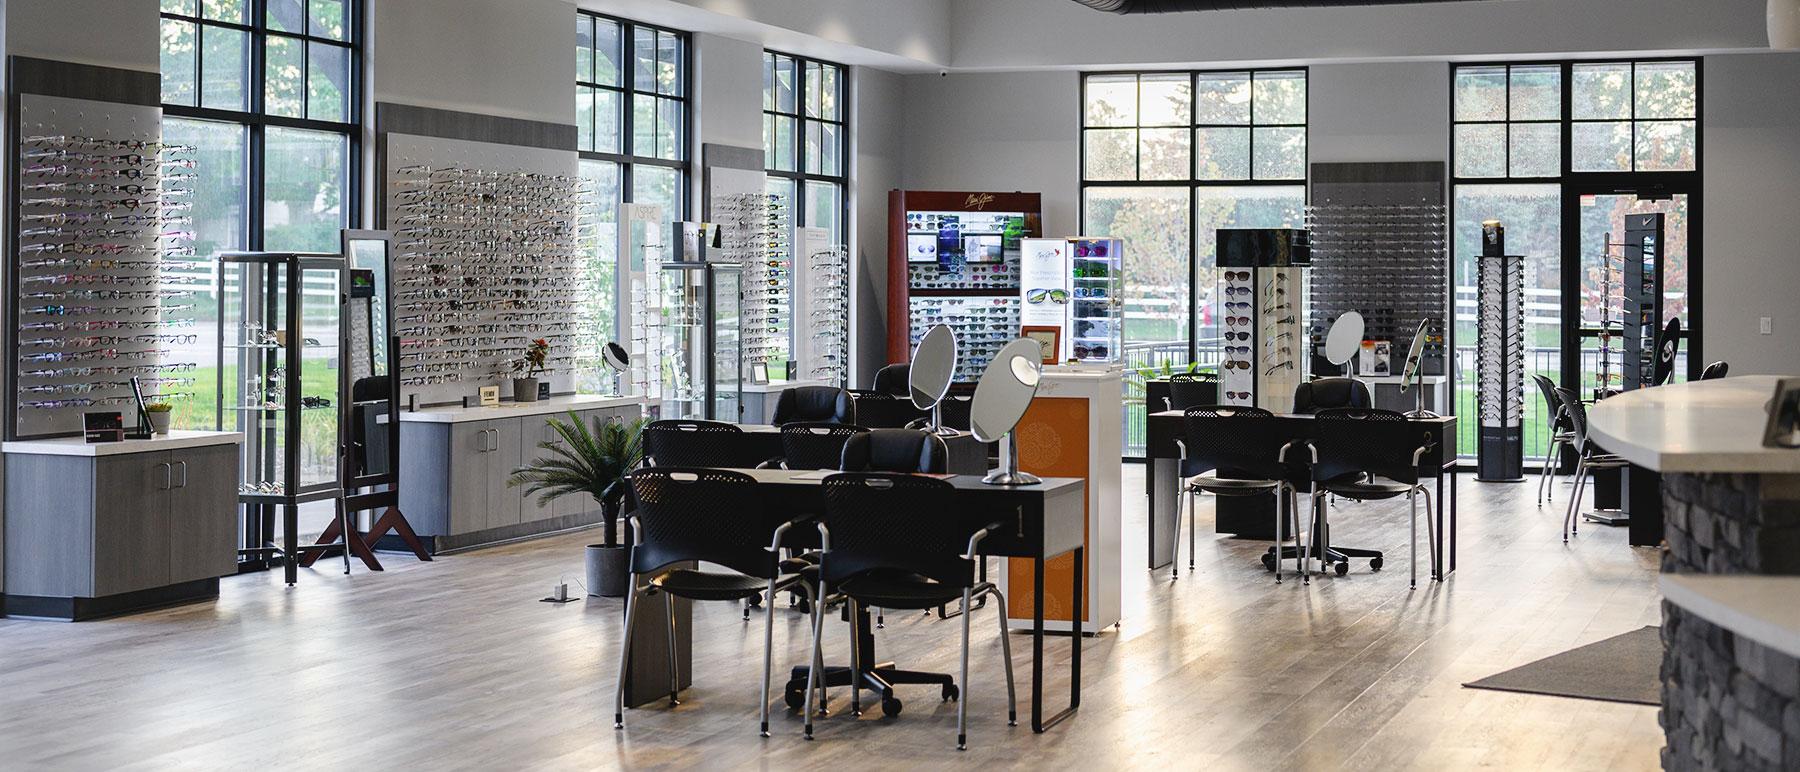 optical galleries at Lakeshore Eyecare Center